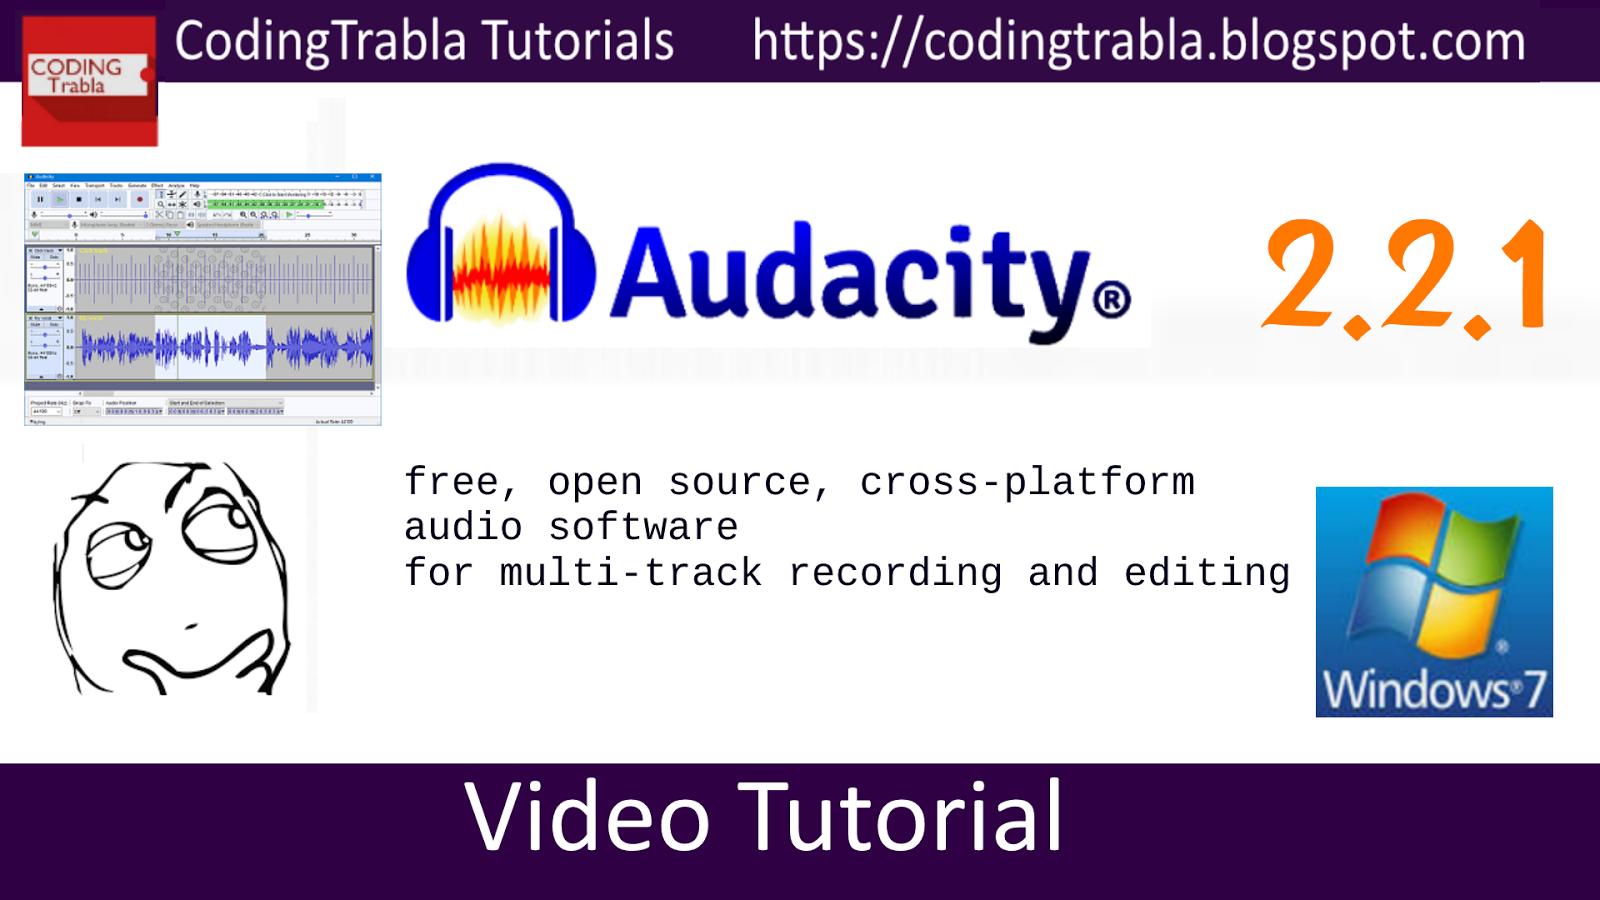 codingtrabla: Install Audacity 2 2 1 on Windows - free